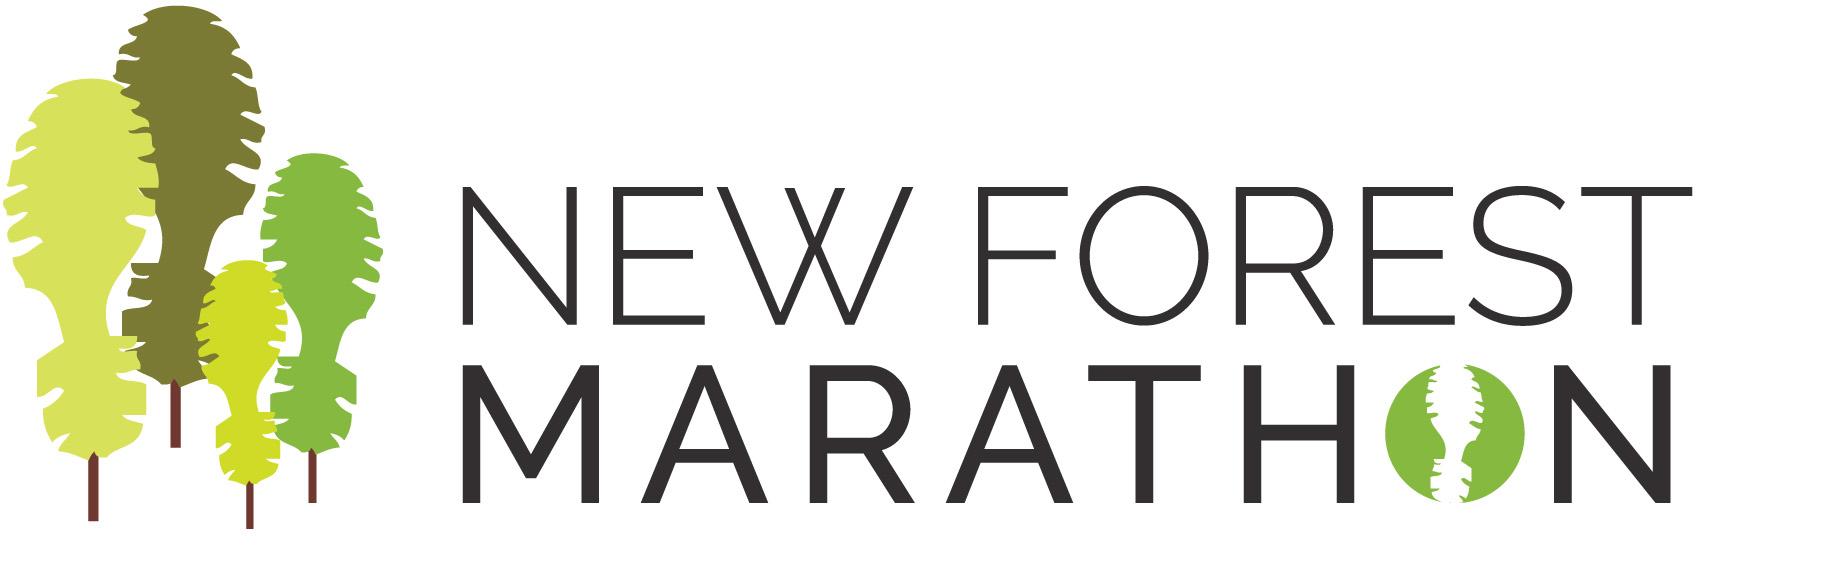 New Forest Marathon_Logo_ConceptsAW2.indd